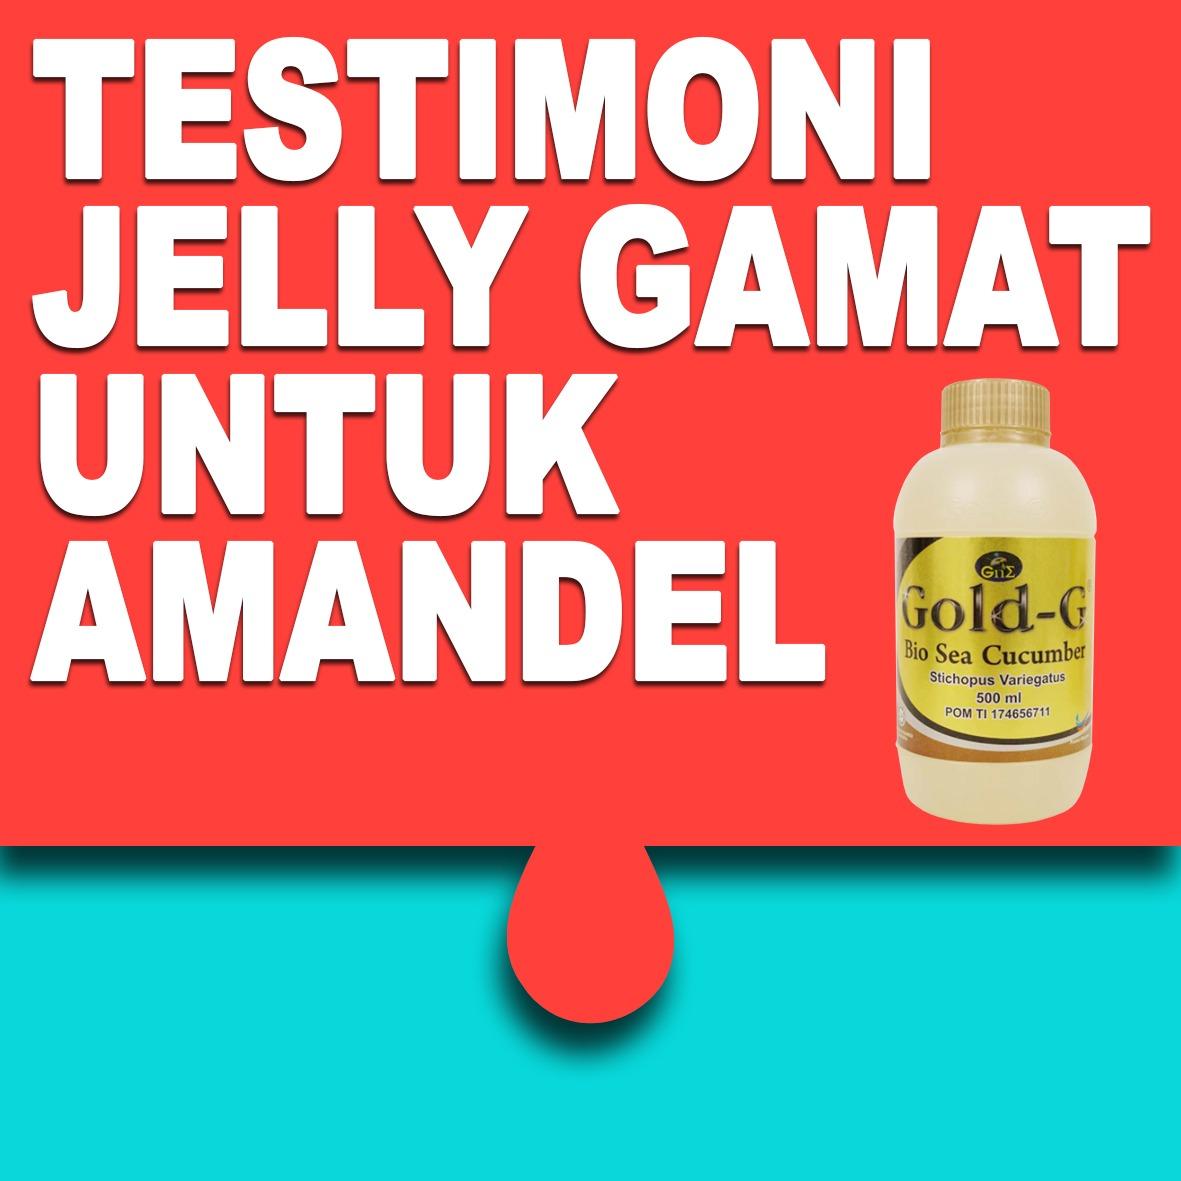 Testimoni Jelly Gamat Gold G Untuk Amandel